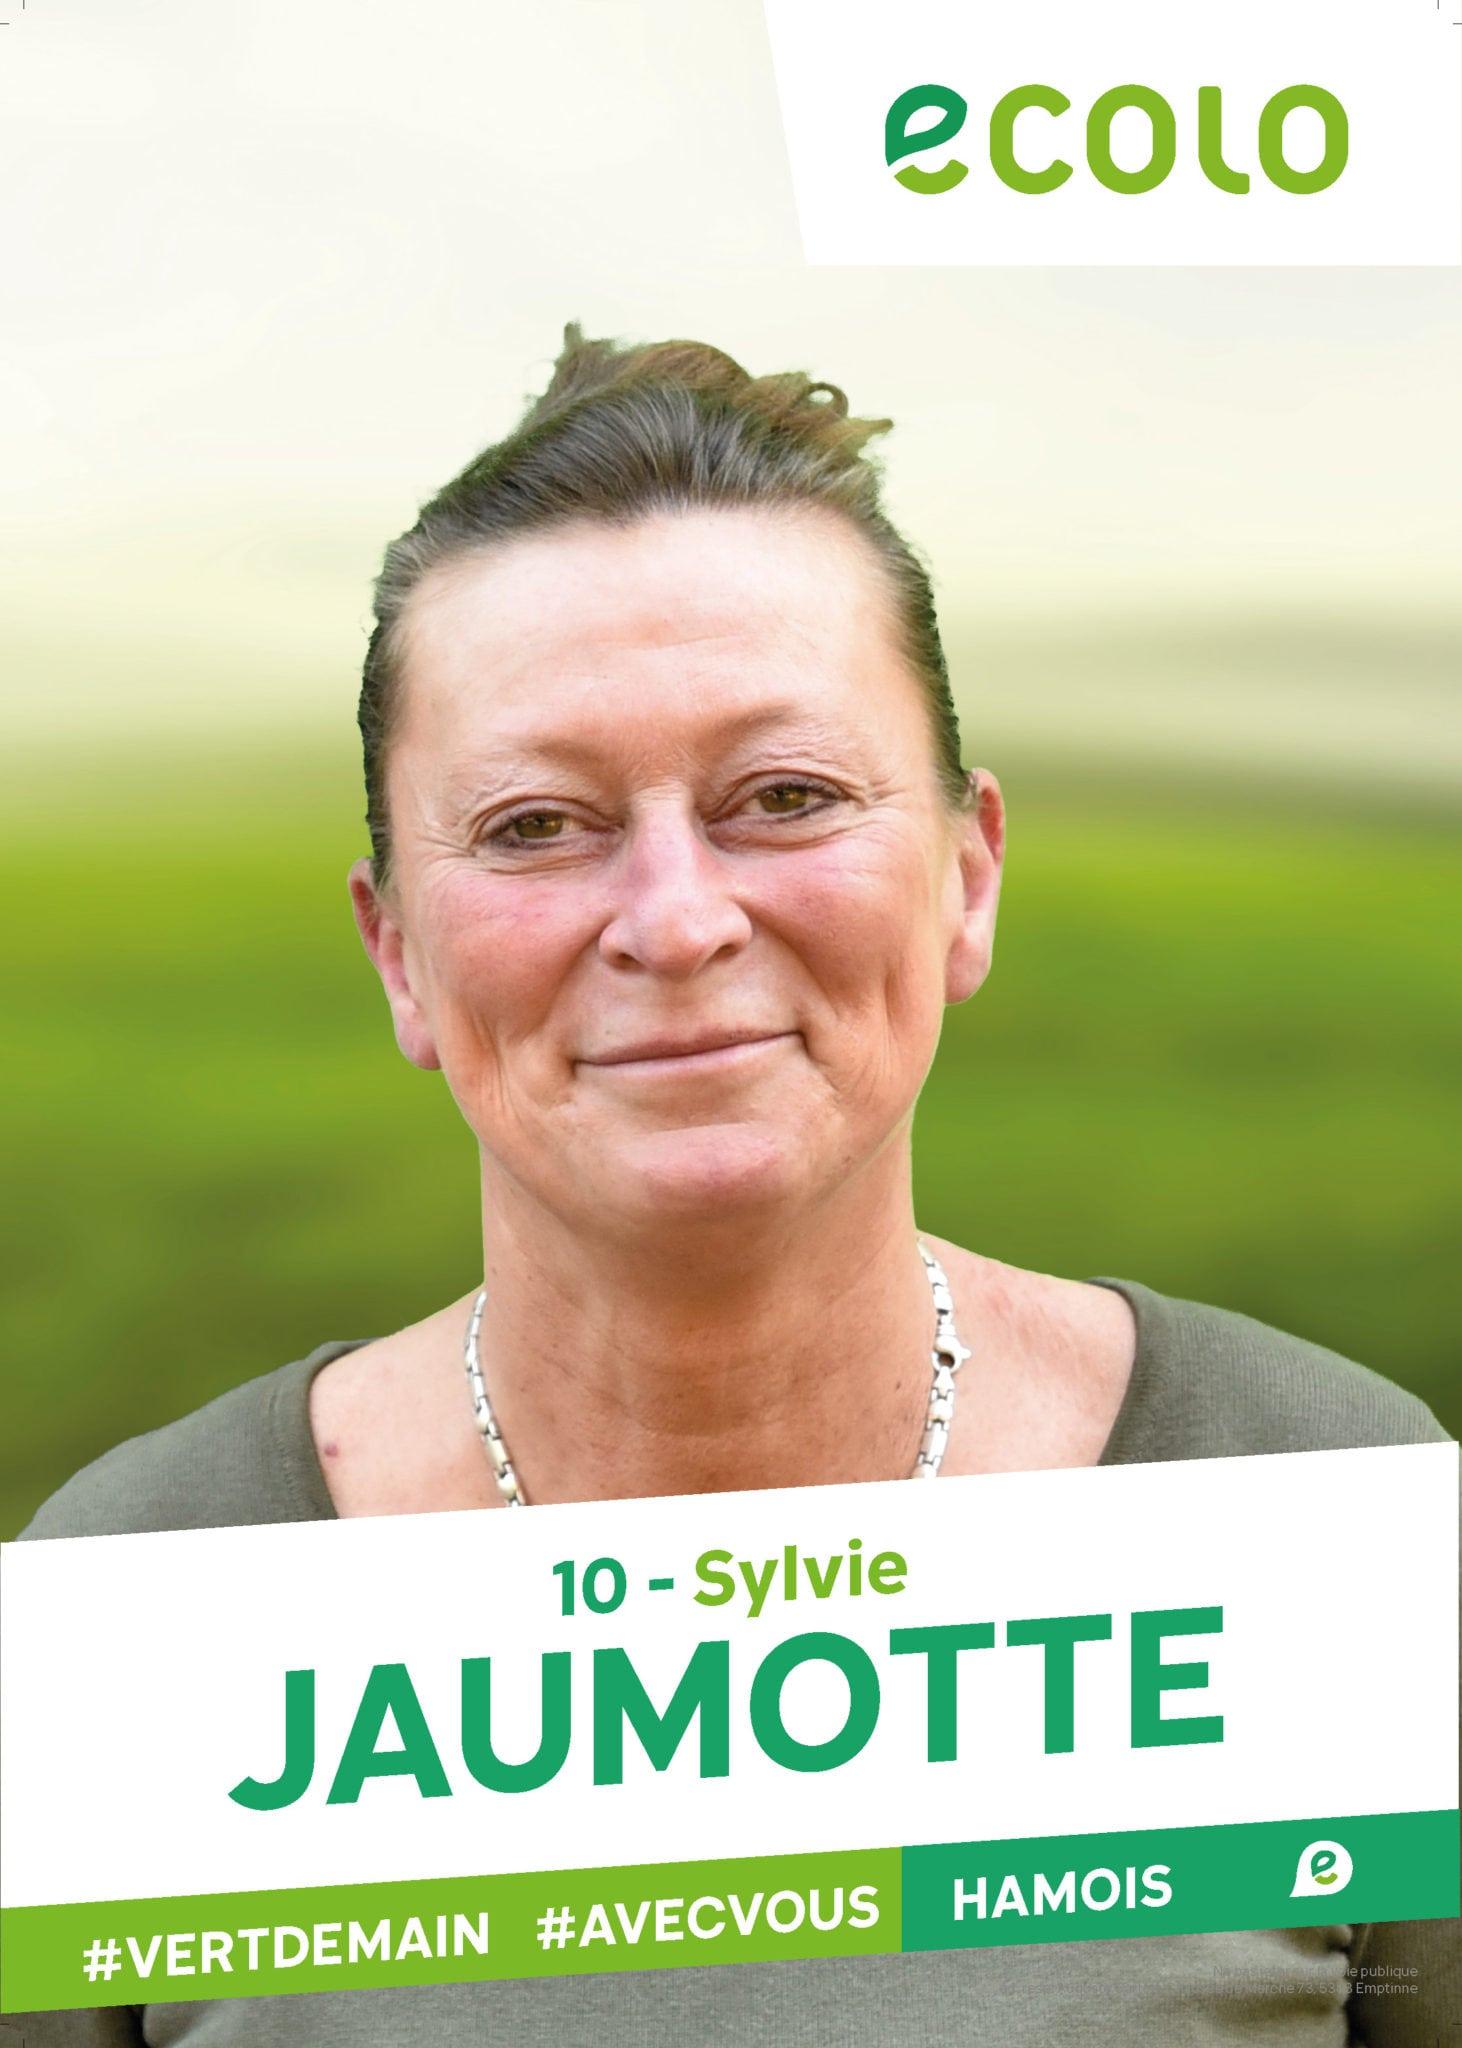 10 - Sylvie JAUMOTTE